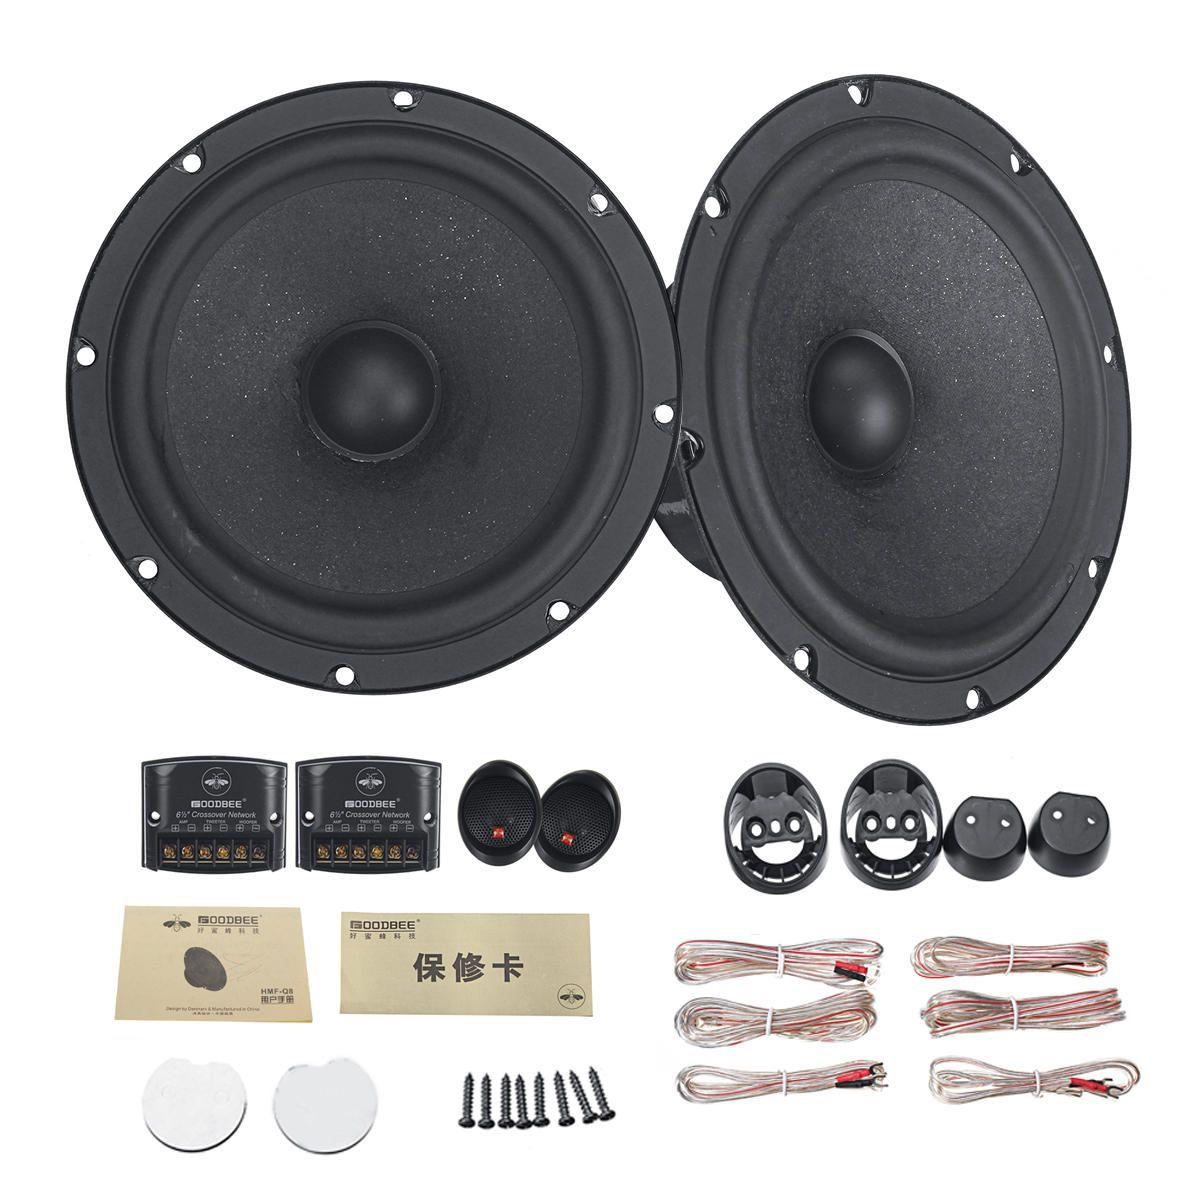 6.5 Inch 100W Car Audio Component Speaker System 2 Way Subwoofer Tweeter